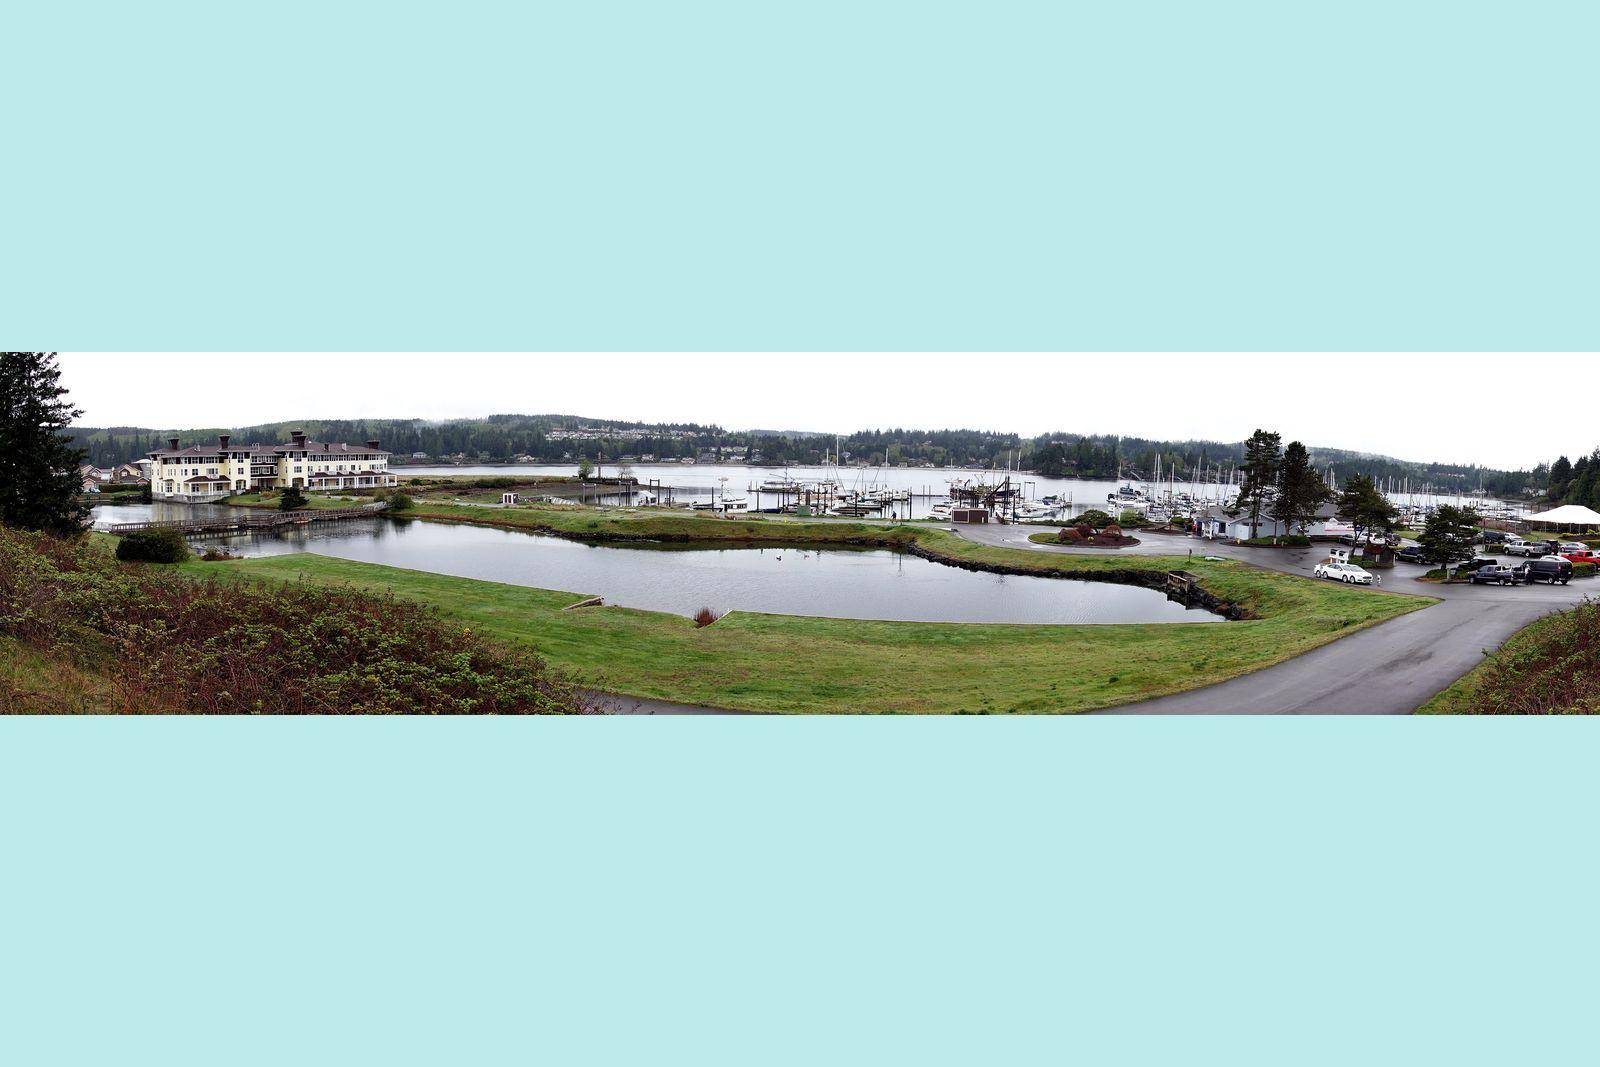 Port Ludlow Inn and marina